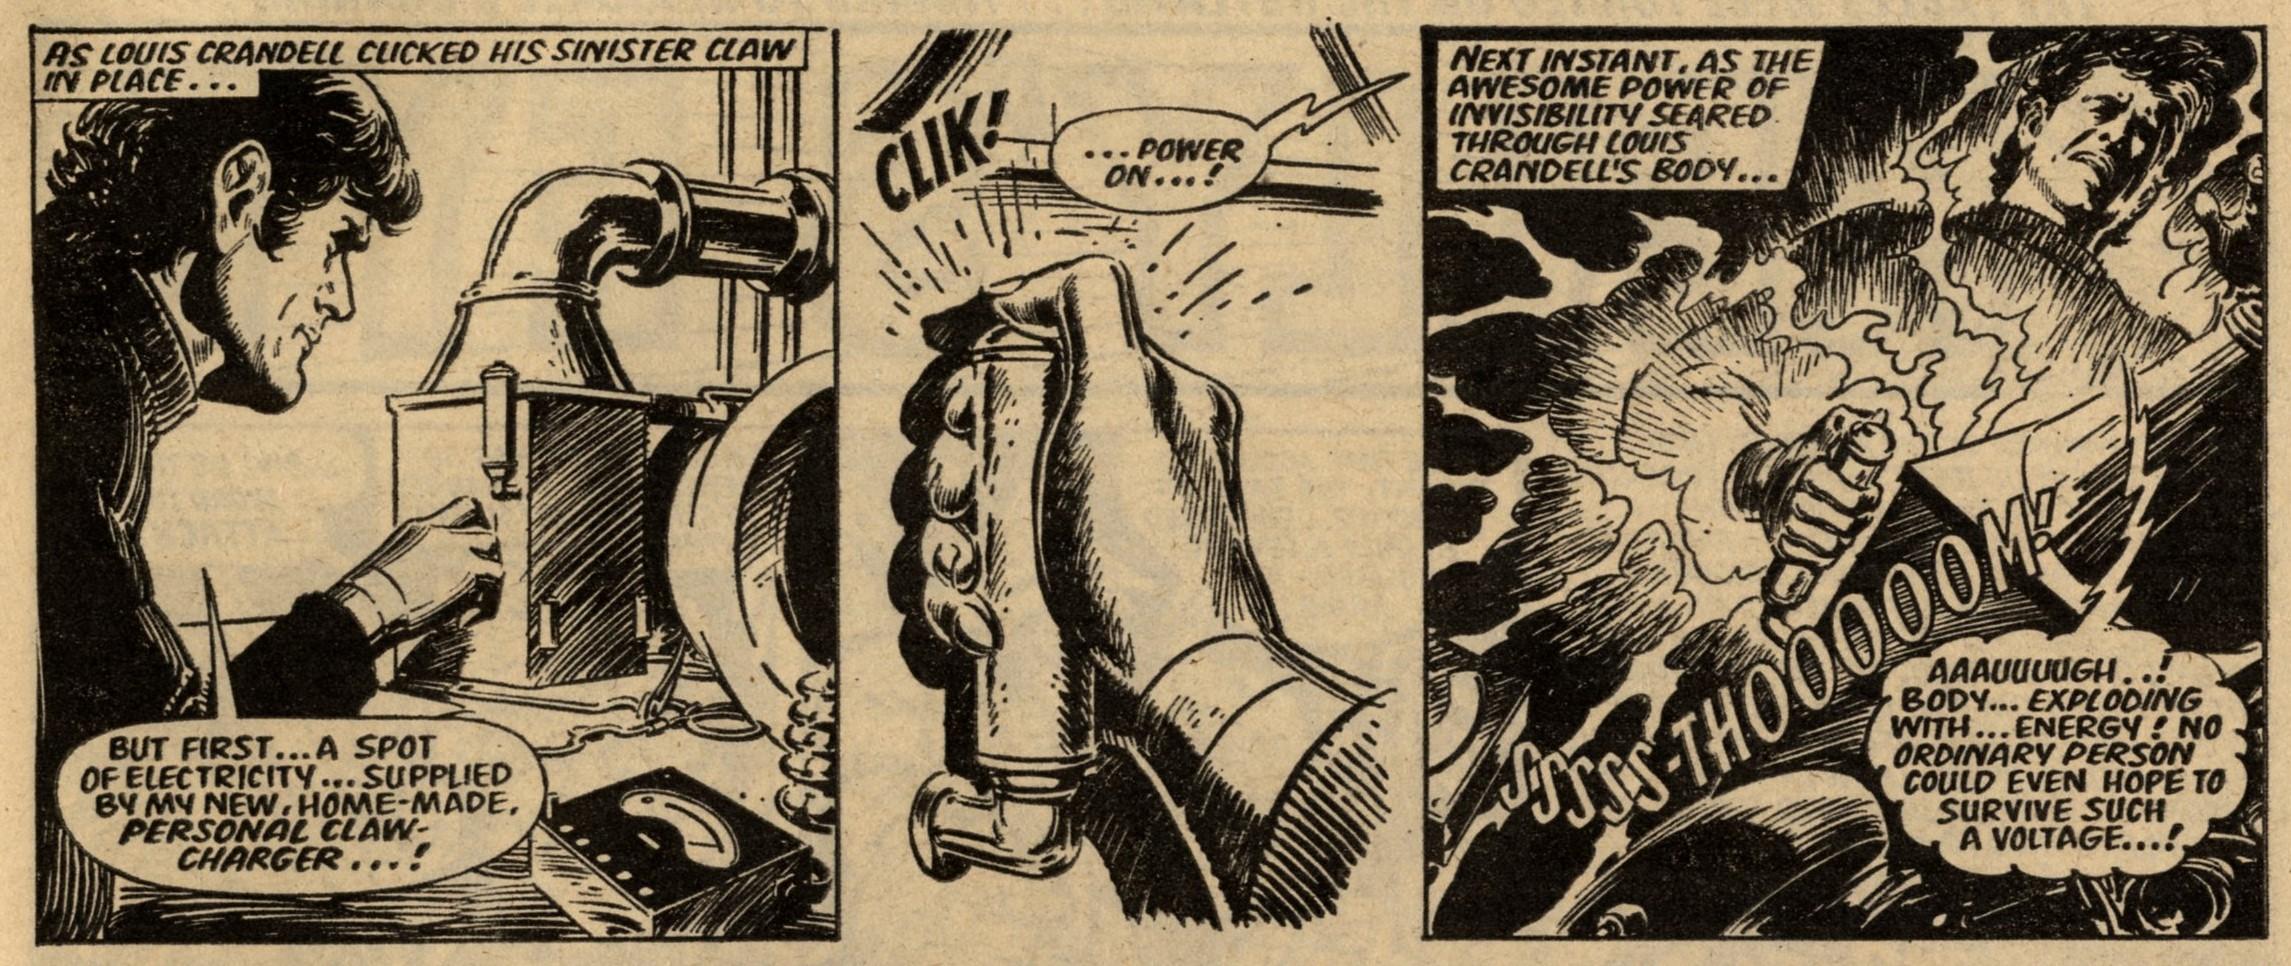 The Return of the Claw: Tom Tully (writer), Jesus Blasco (artist)